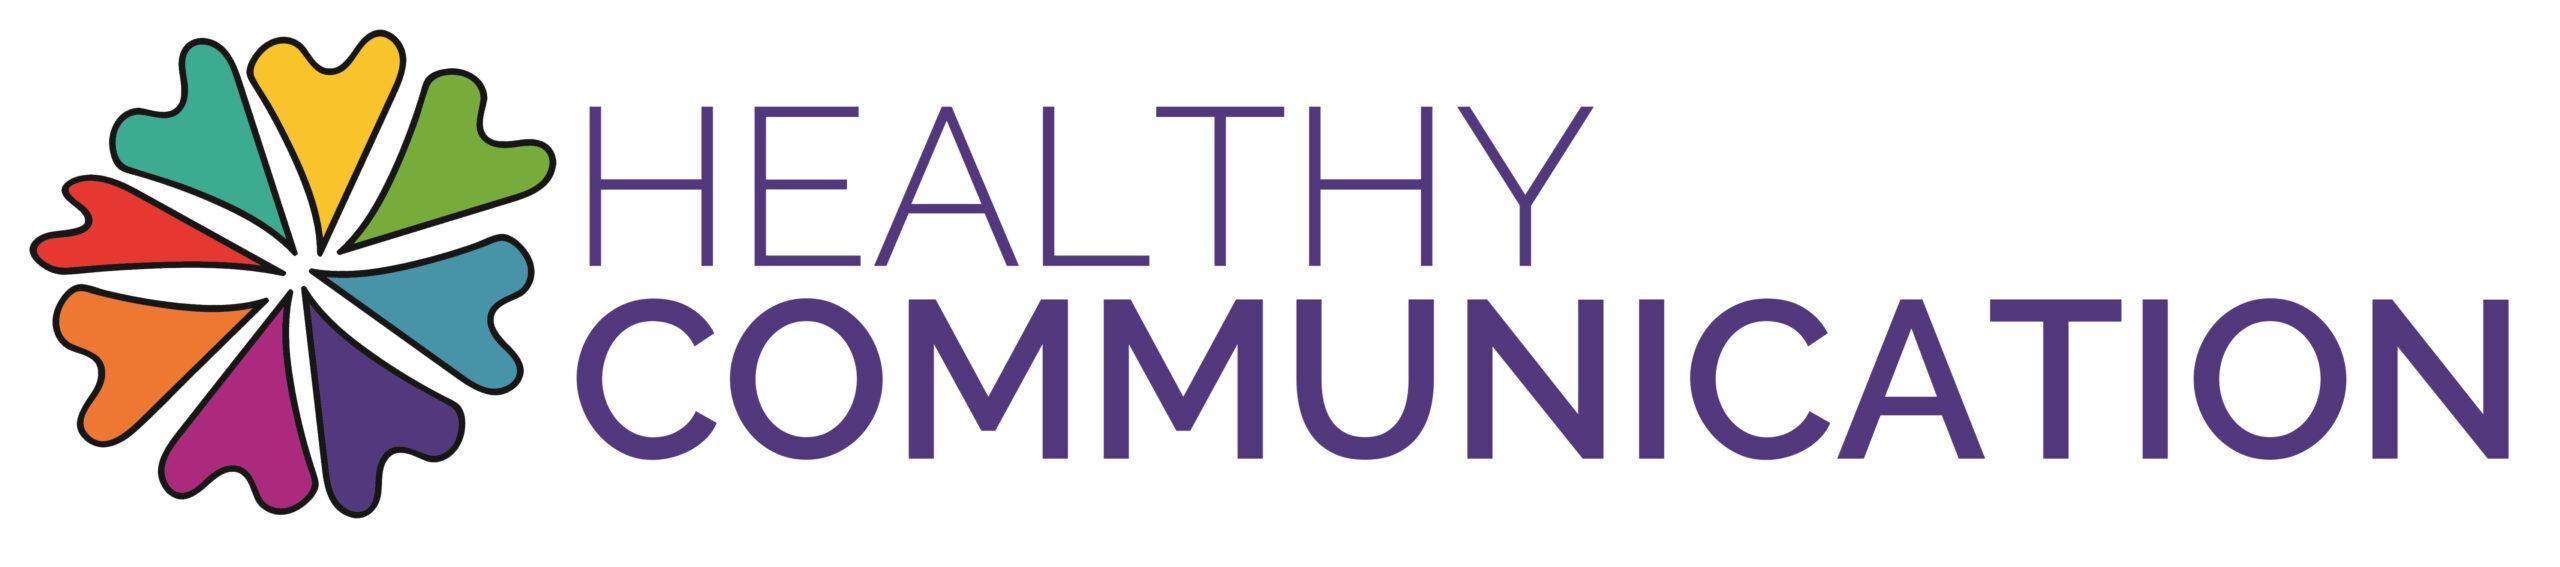 Healthy Communication